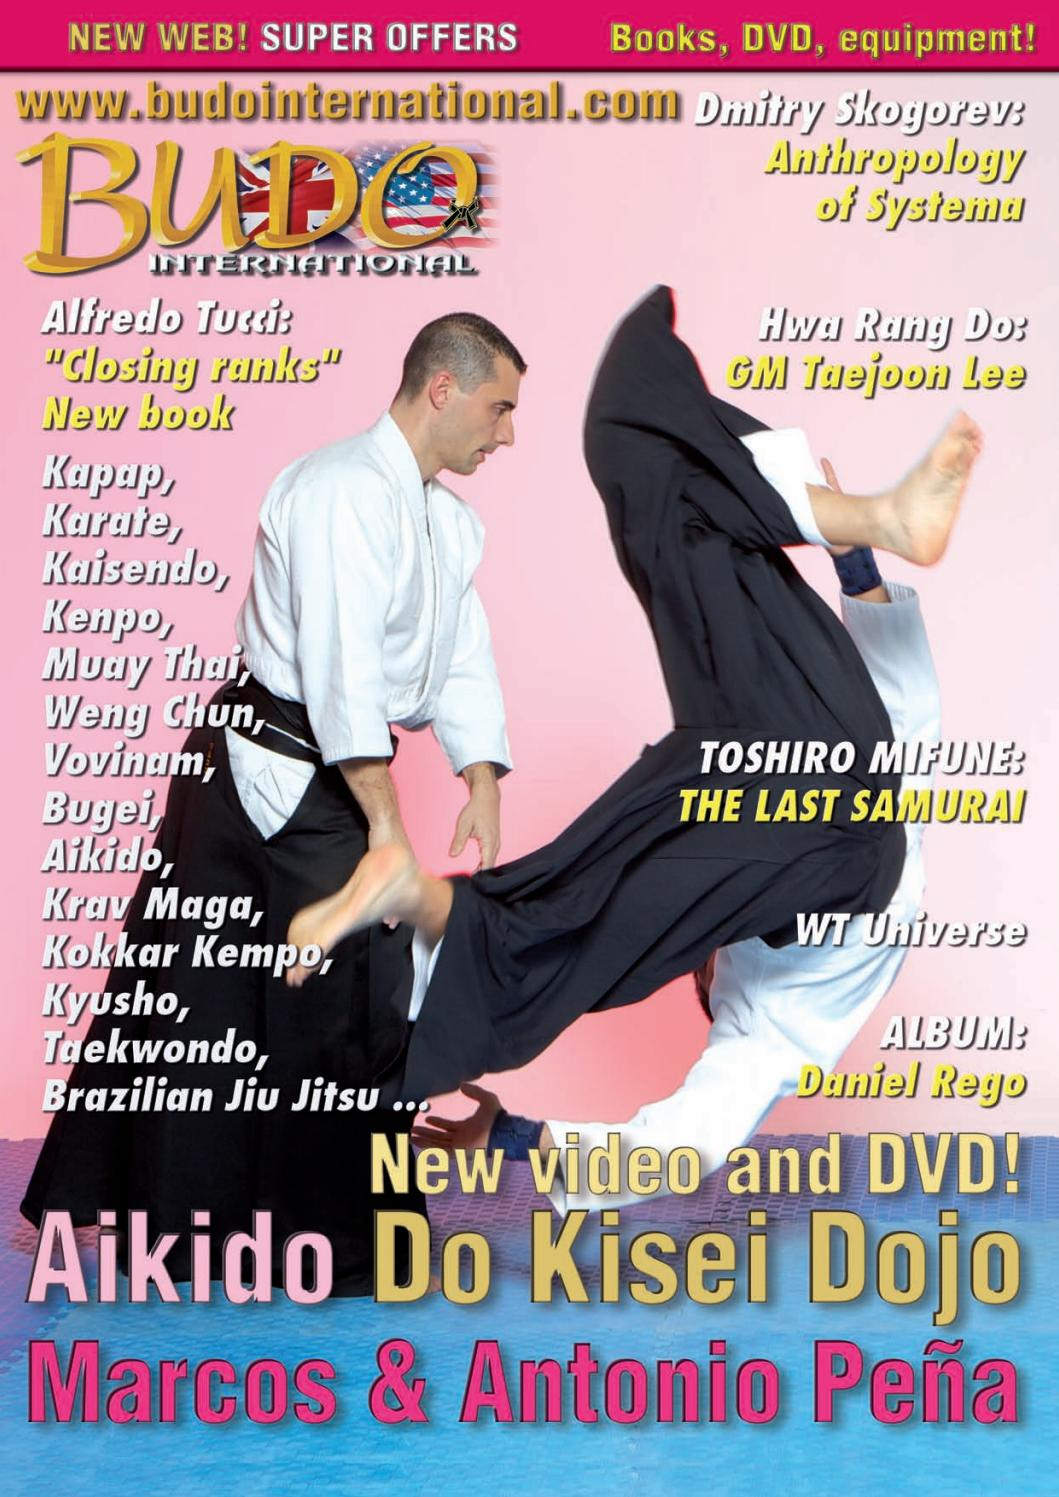 2 SHOTOKAN TIGER KARATE-DO LOGO DECAL//STICKER WINDOW FIGHTER MMA MARTIAL ARTS